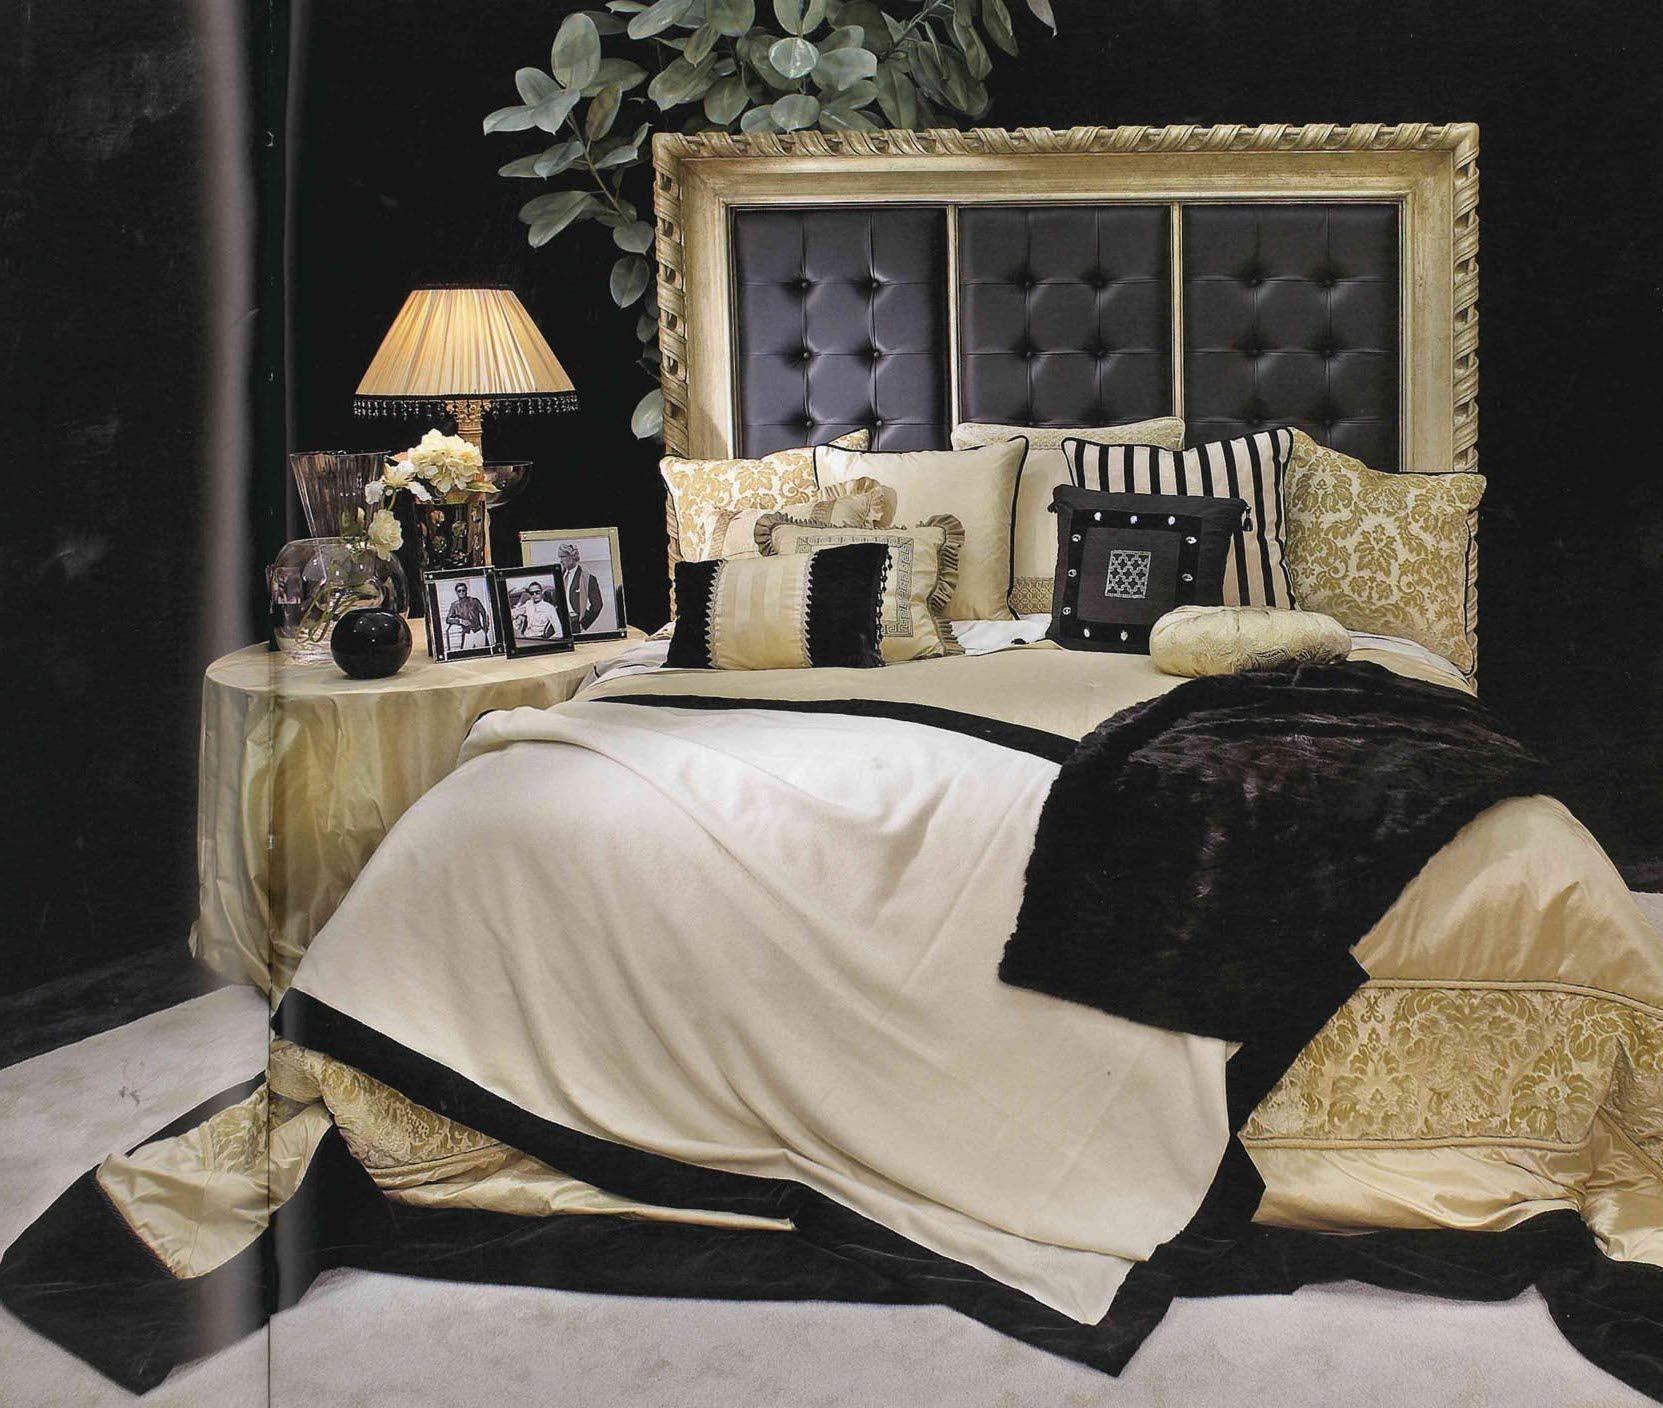 Italian Luxury Brands For Design   Itu0027s An Italian Business On Wevux.com  GRANDI NOMI